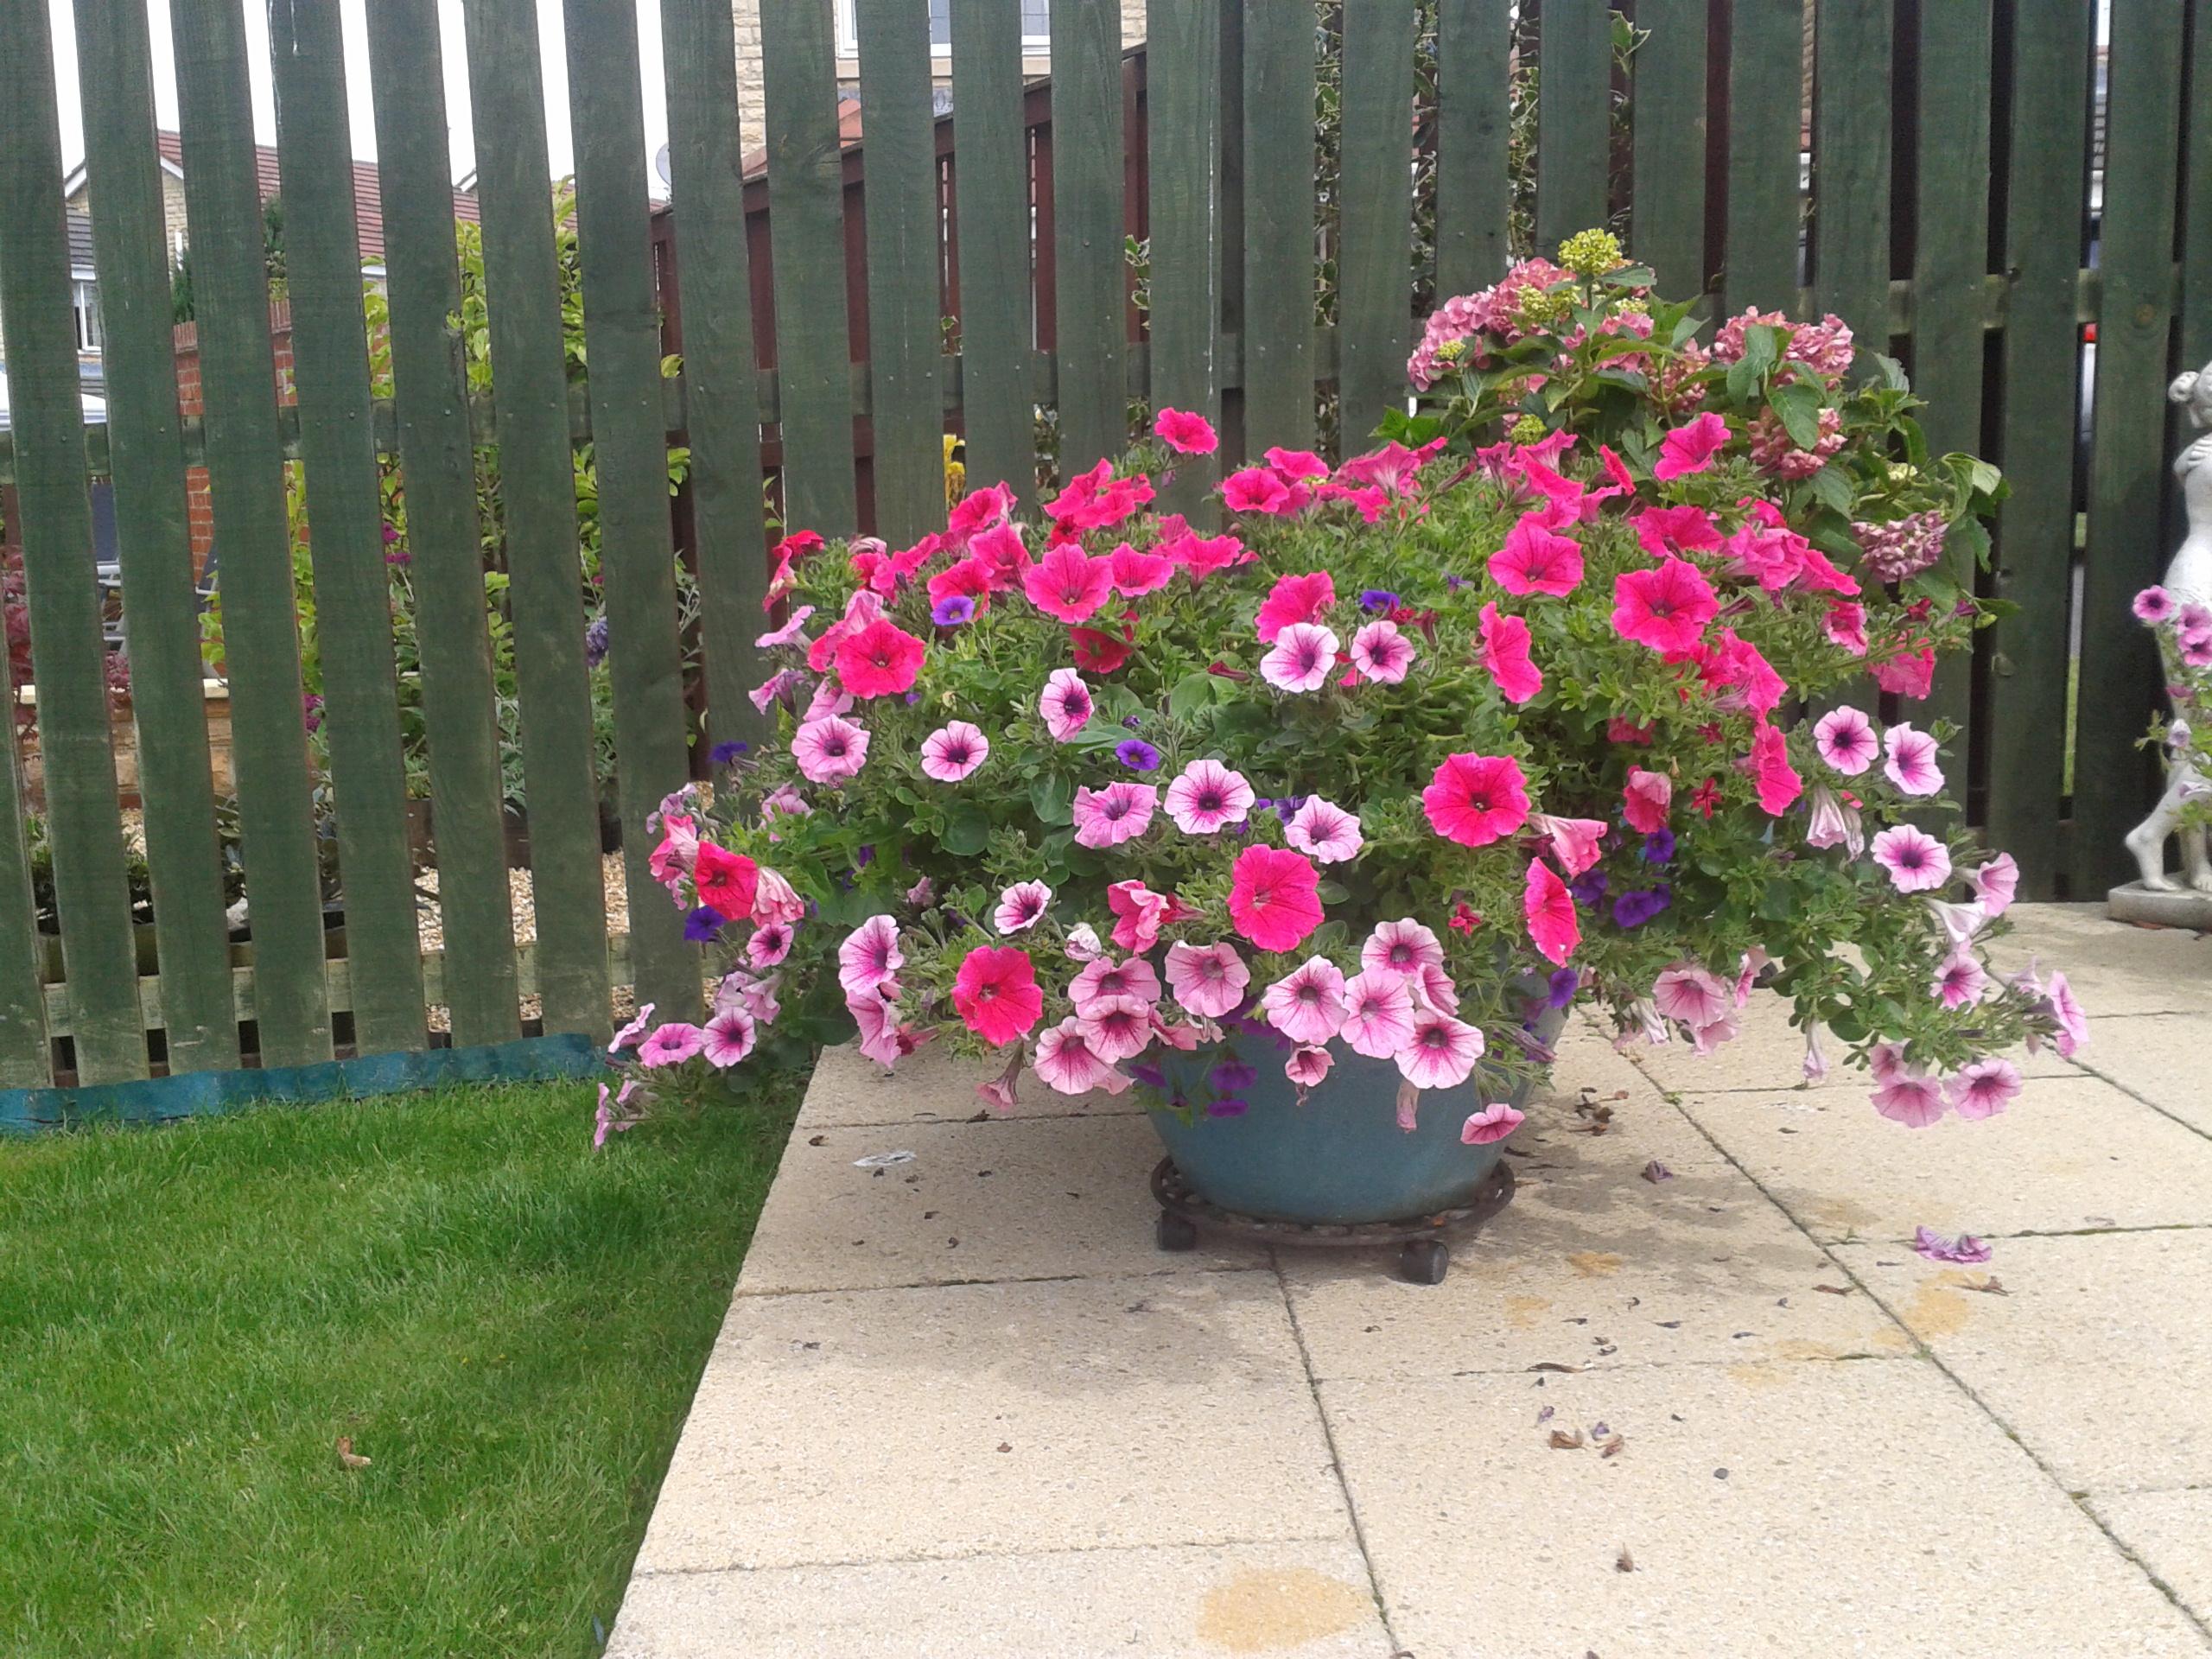 Jean- Flowers using Greenleaf